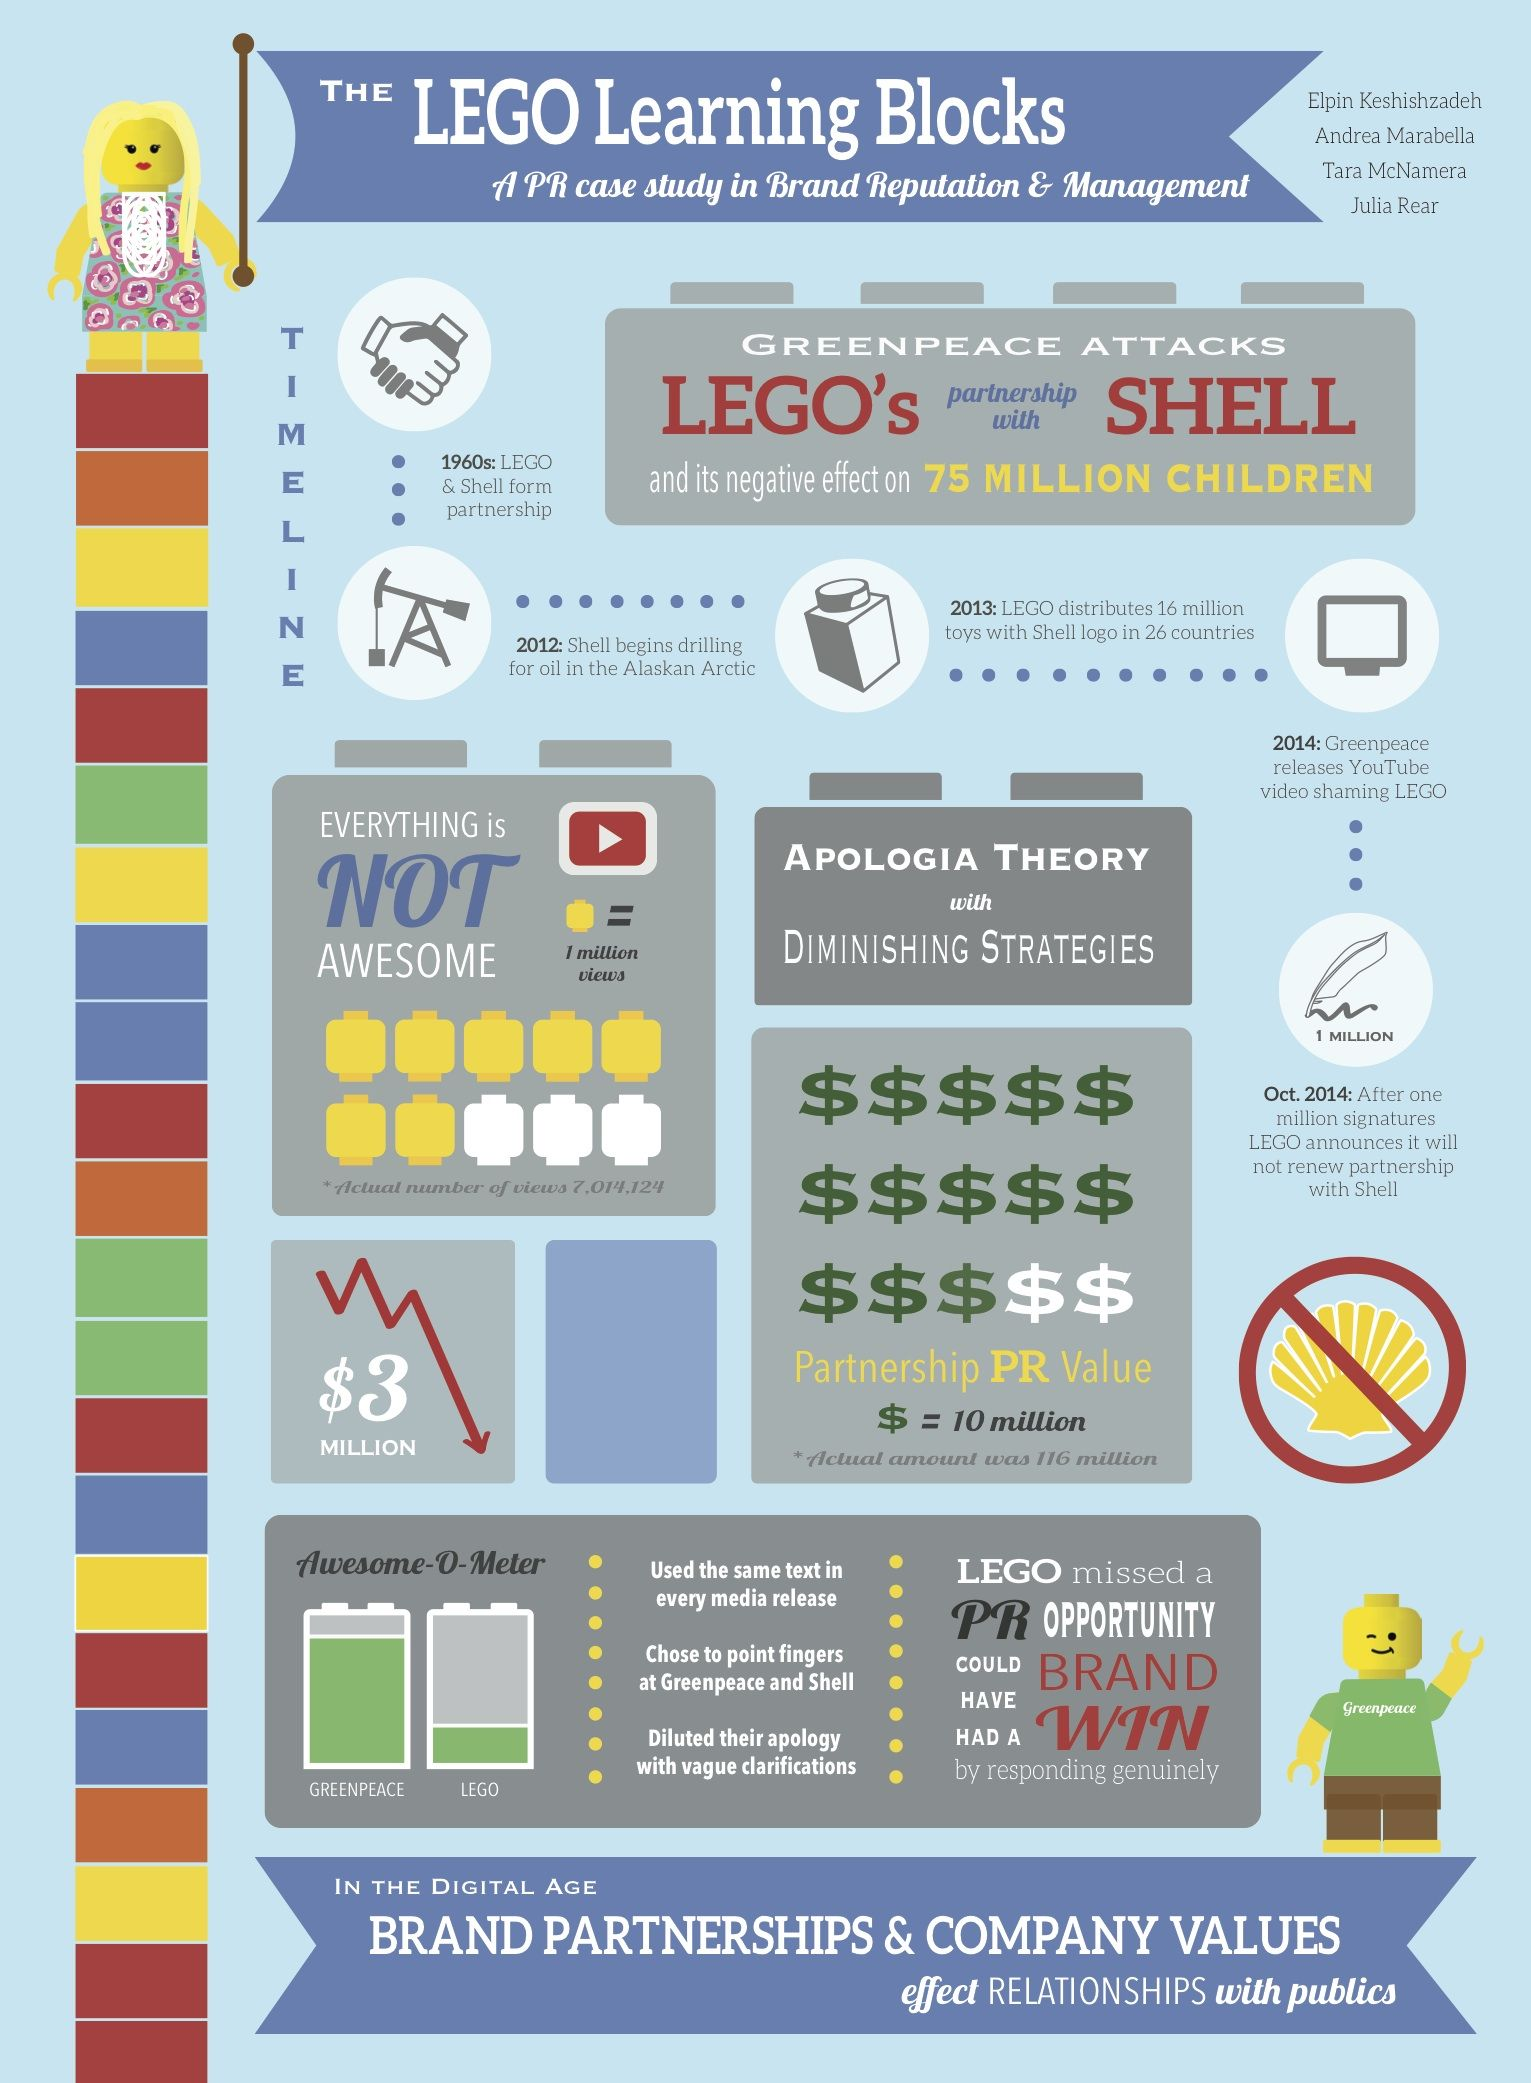 lego pr case study infographic | pr case studies for jms 585